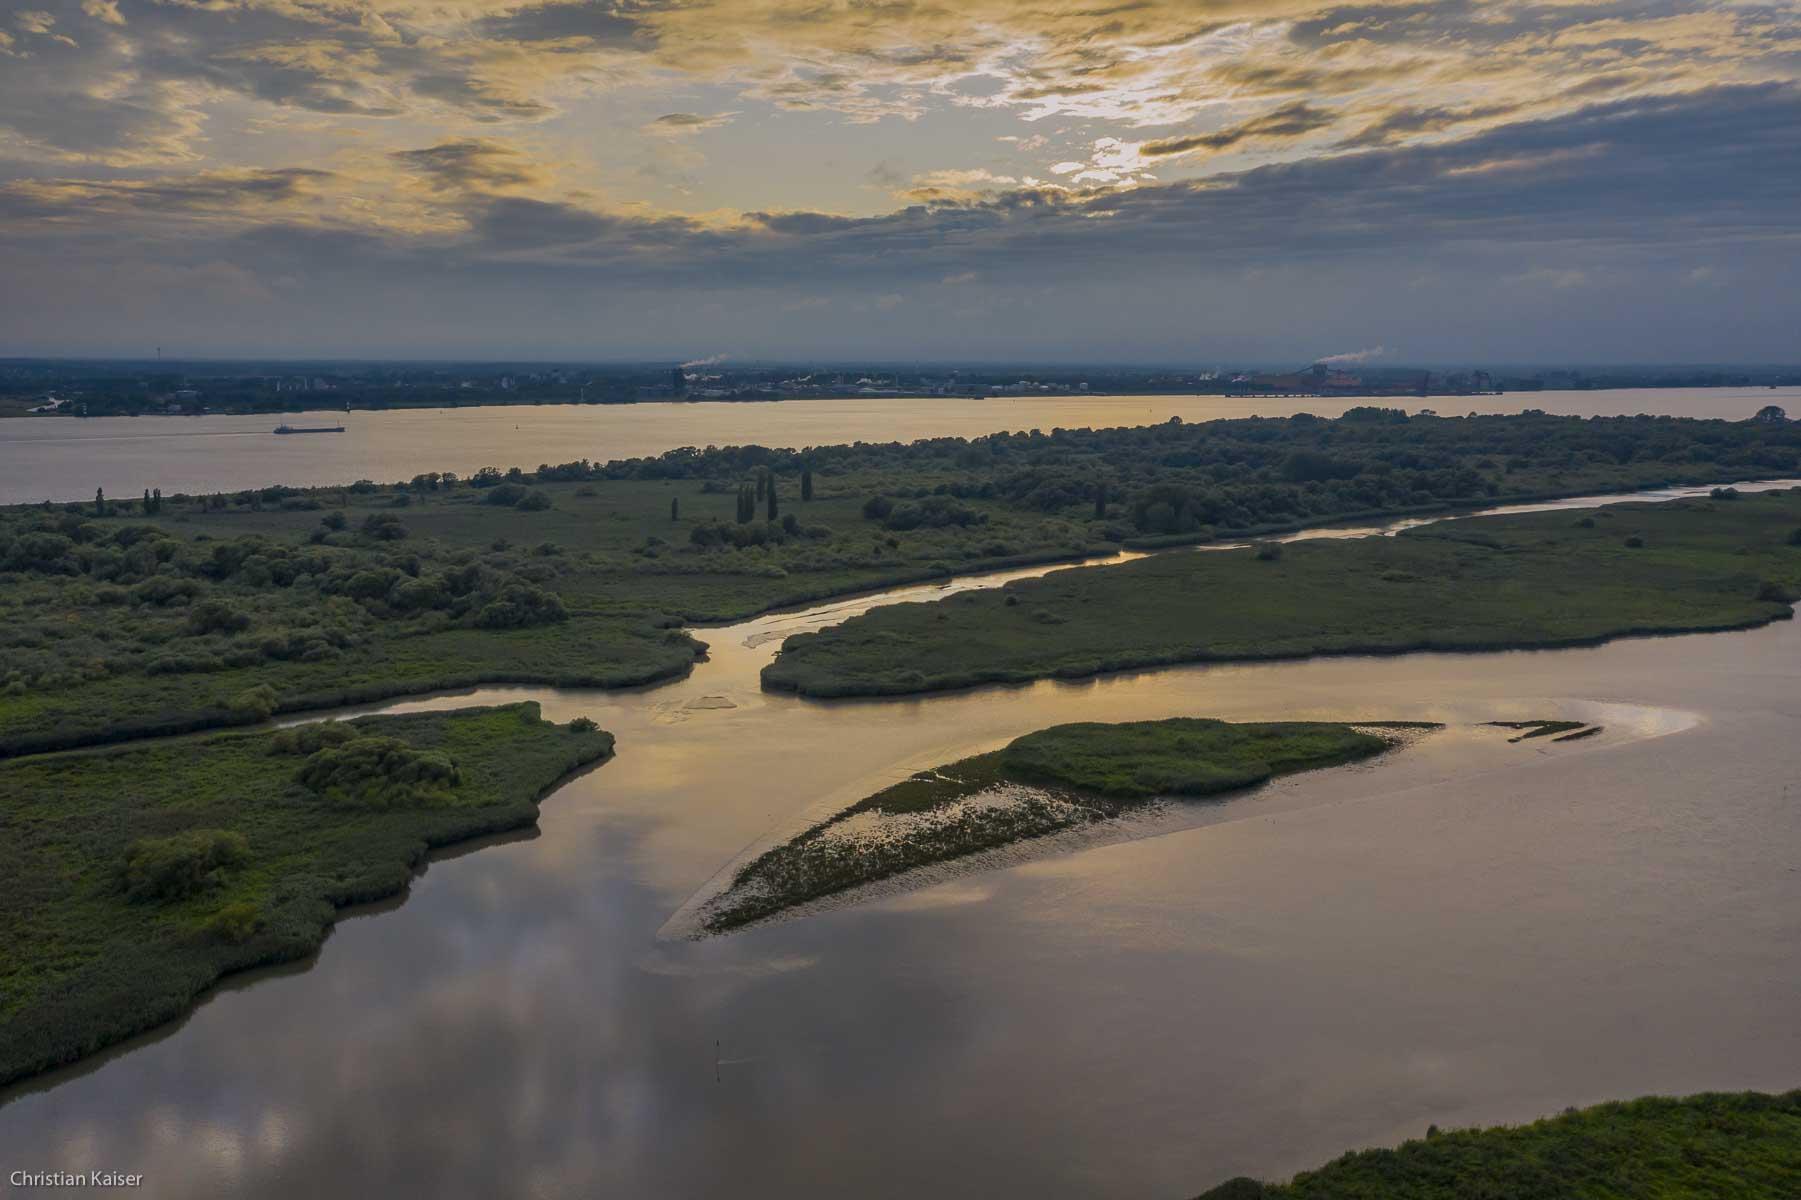 islands Auberg-Drommel, background industrial area Buetzfleth middel an right